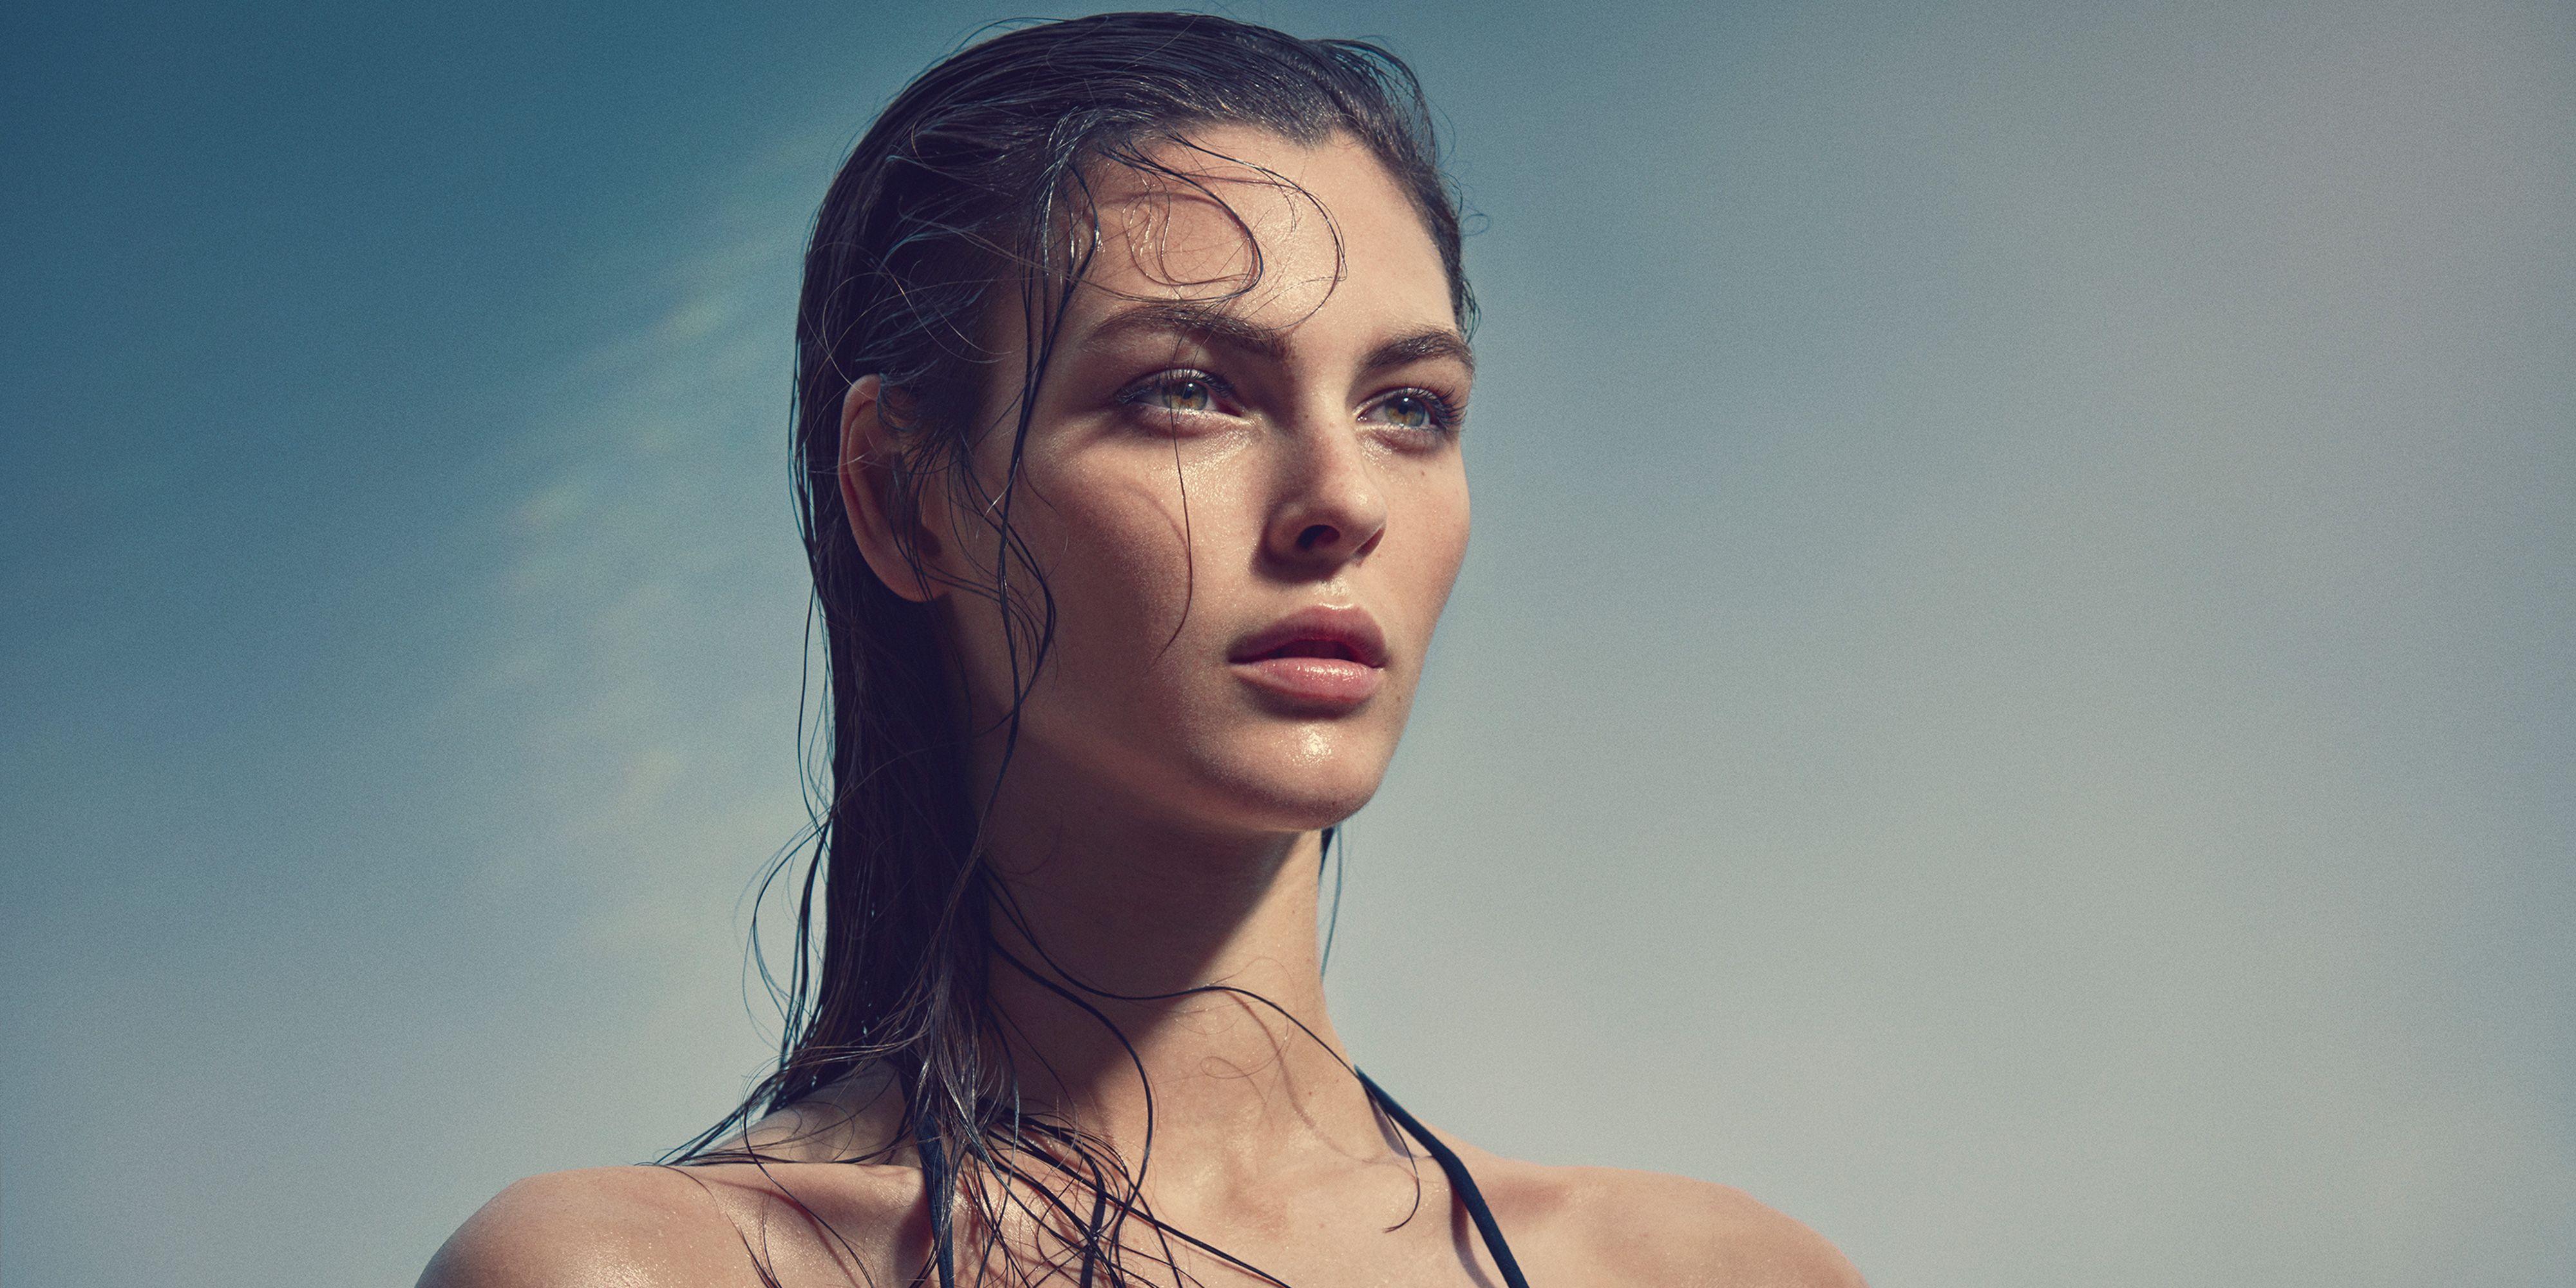 Vittoria Cerriti beauty interview